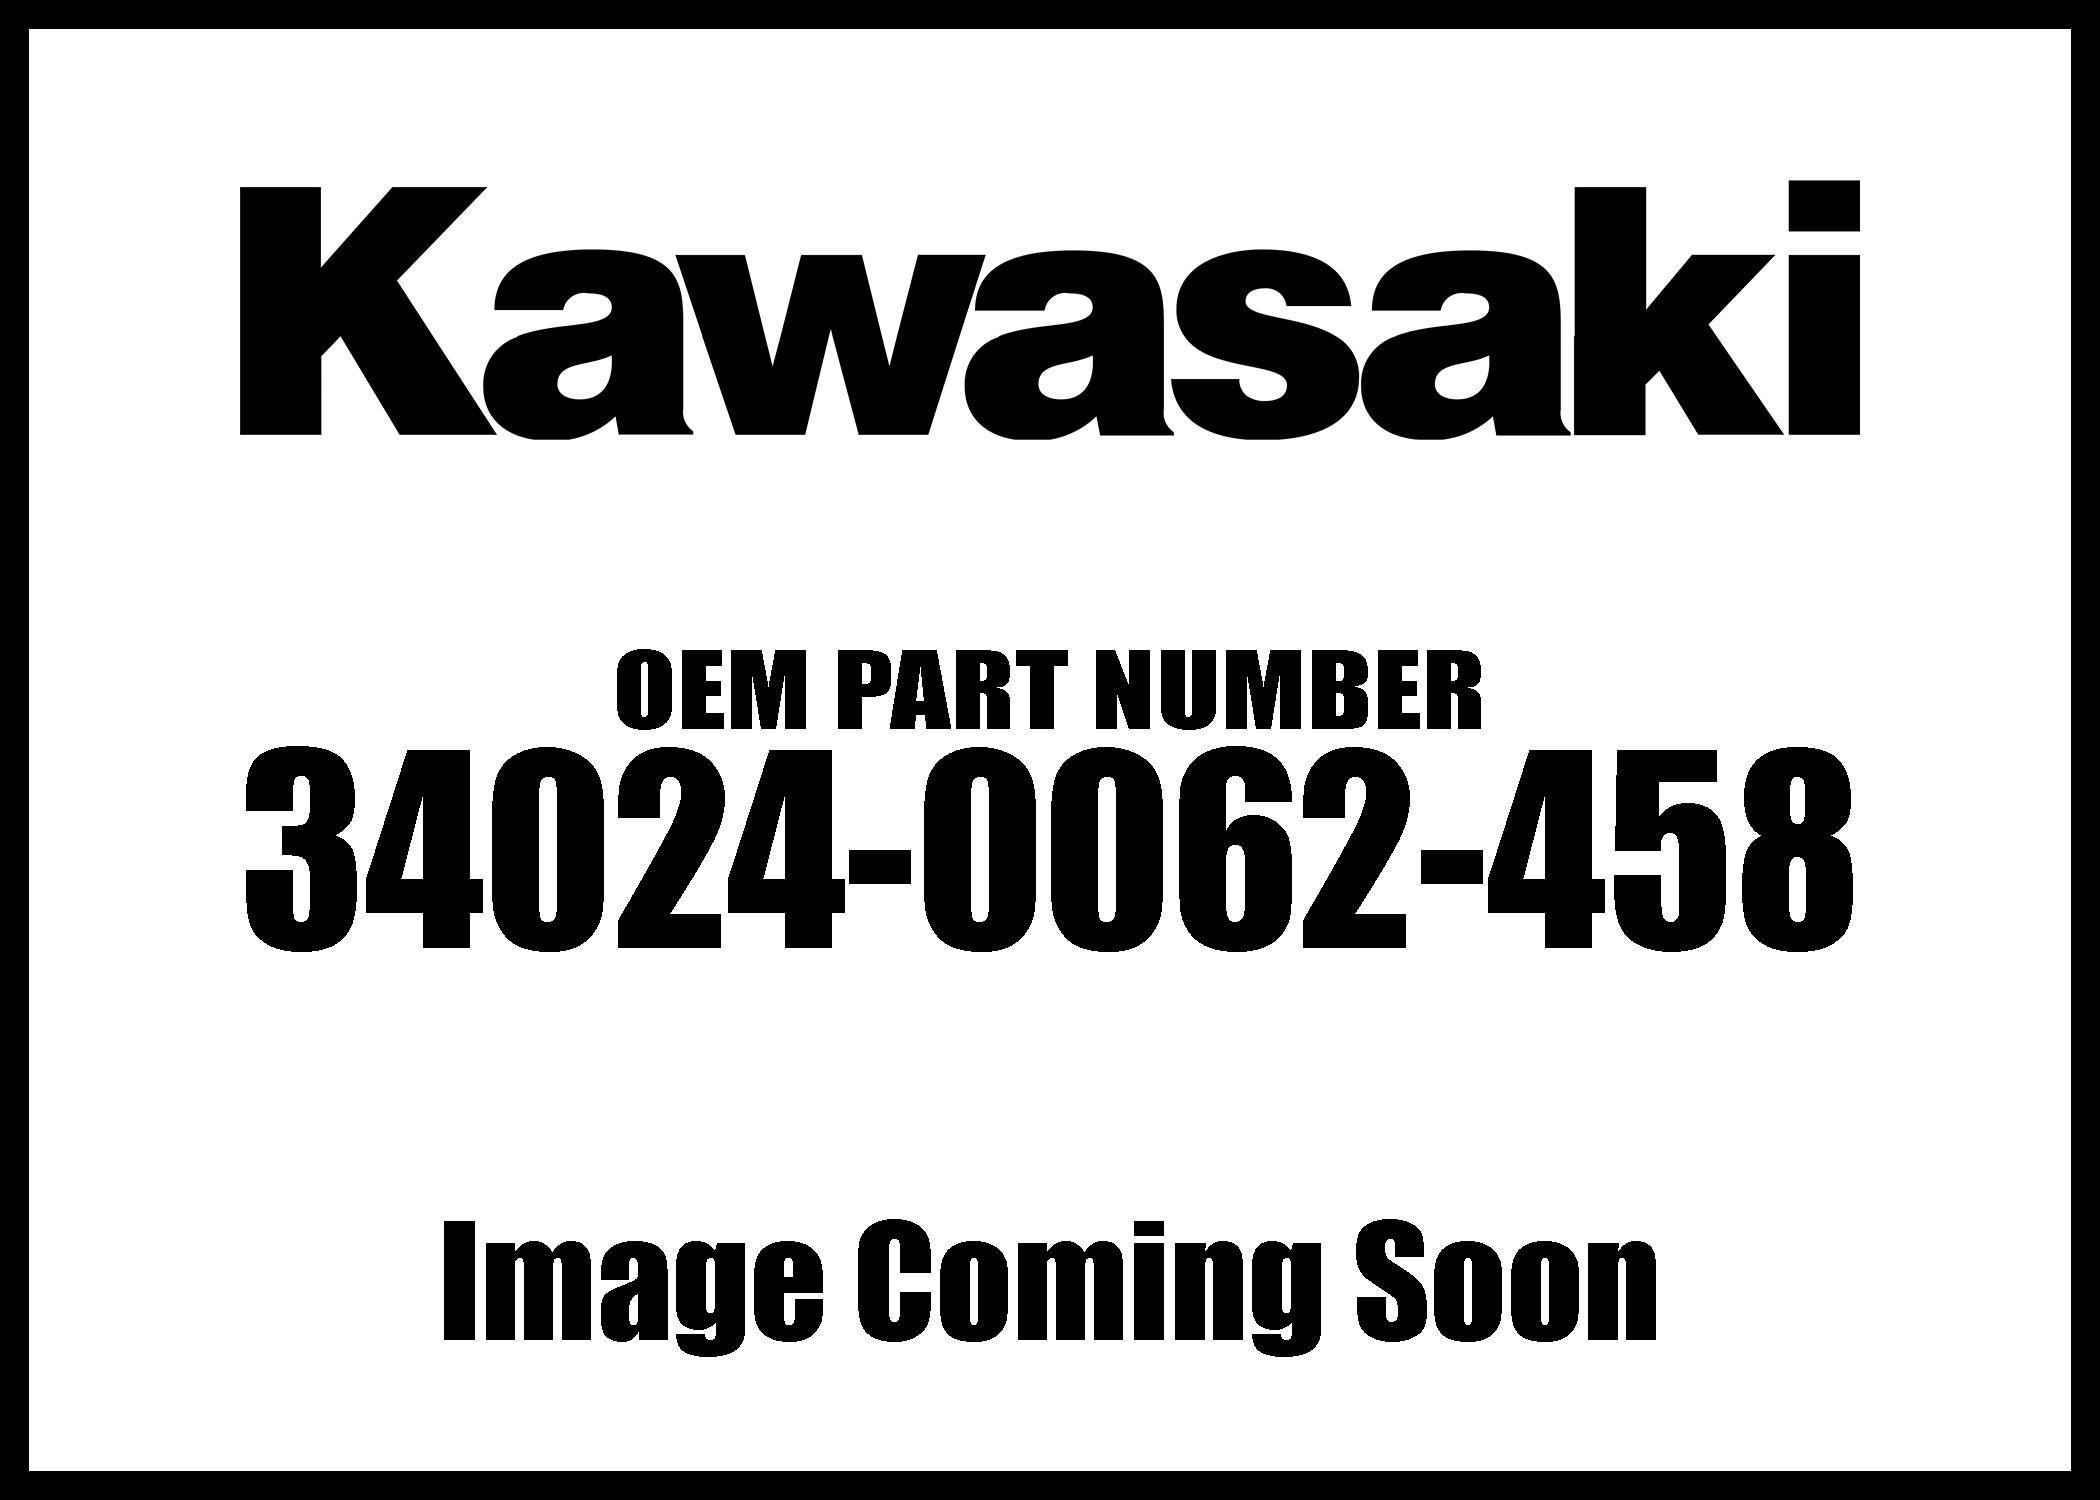 Kawasaki 2008-2018 Klx140 Side P Silver Stand 34024-0062-458 New Oem